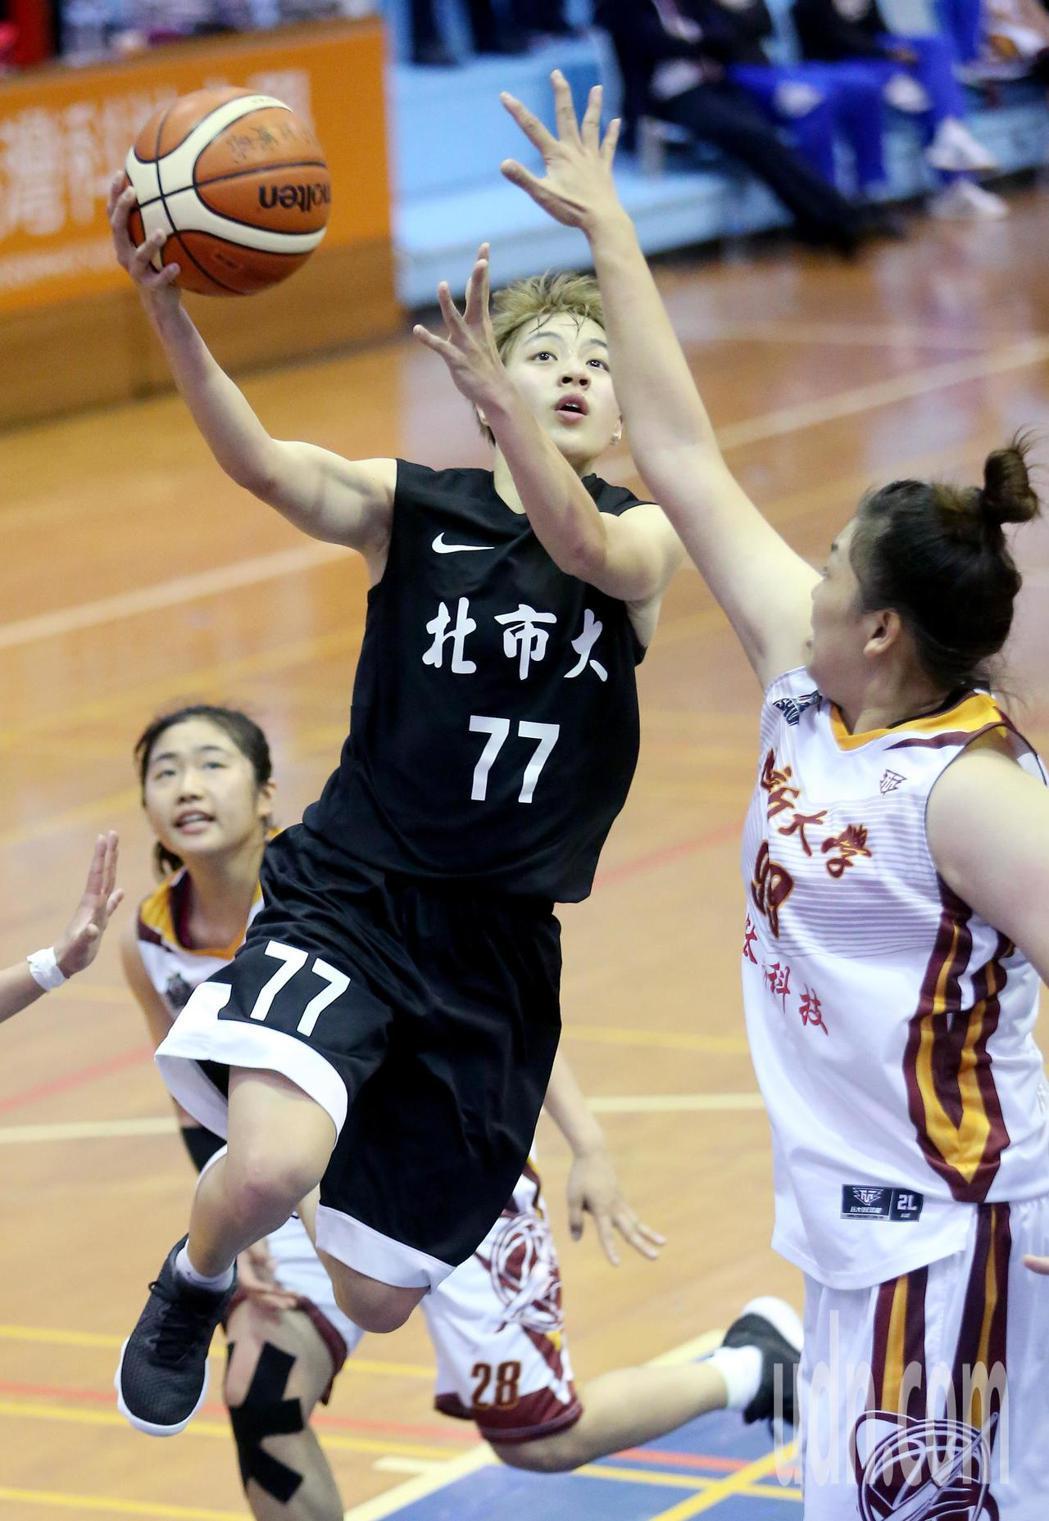 UBA大專籃球聯賽在台灣科大進行女子組賽事,北市大朱育勤(中)突破包夾上籃得分。...